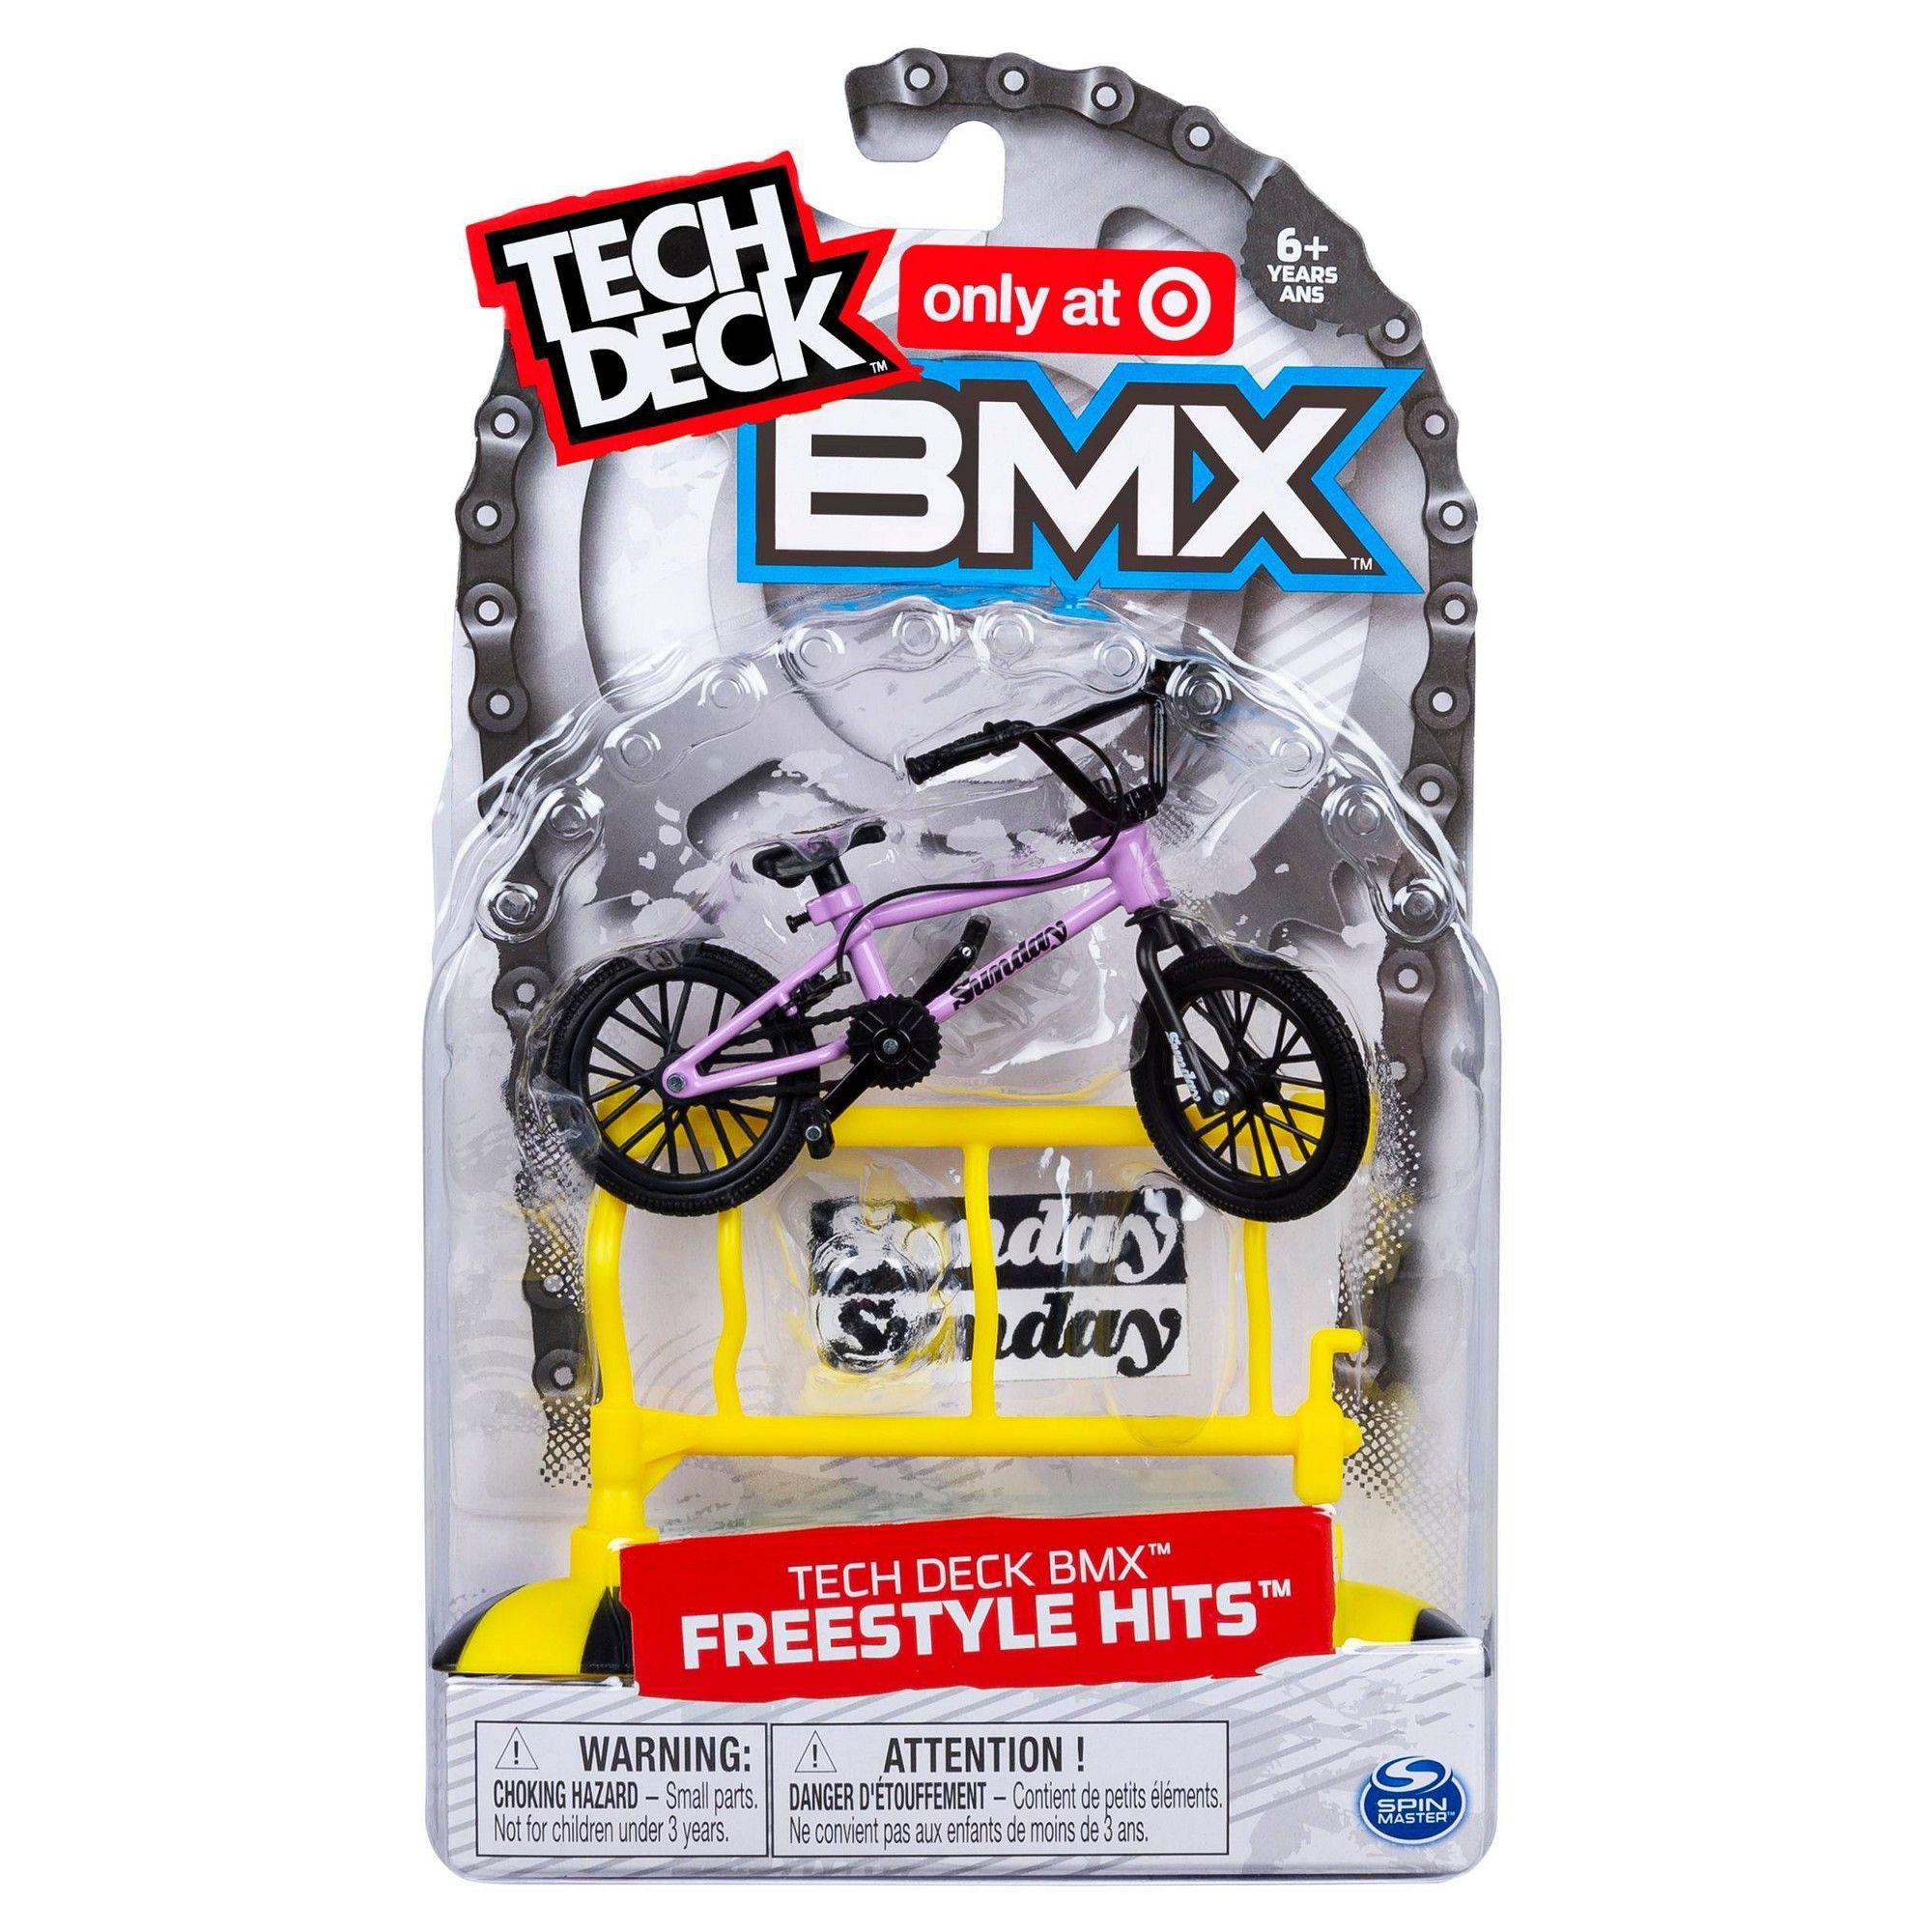 Tech Deck Bmx.com